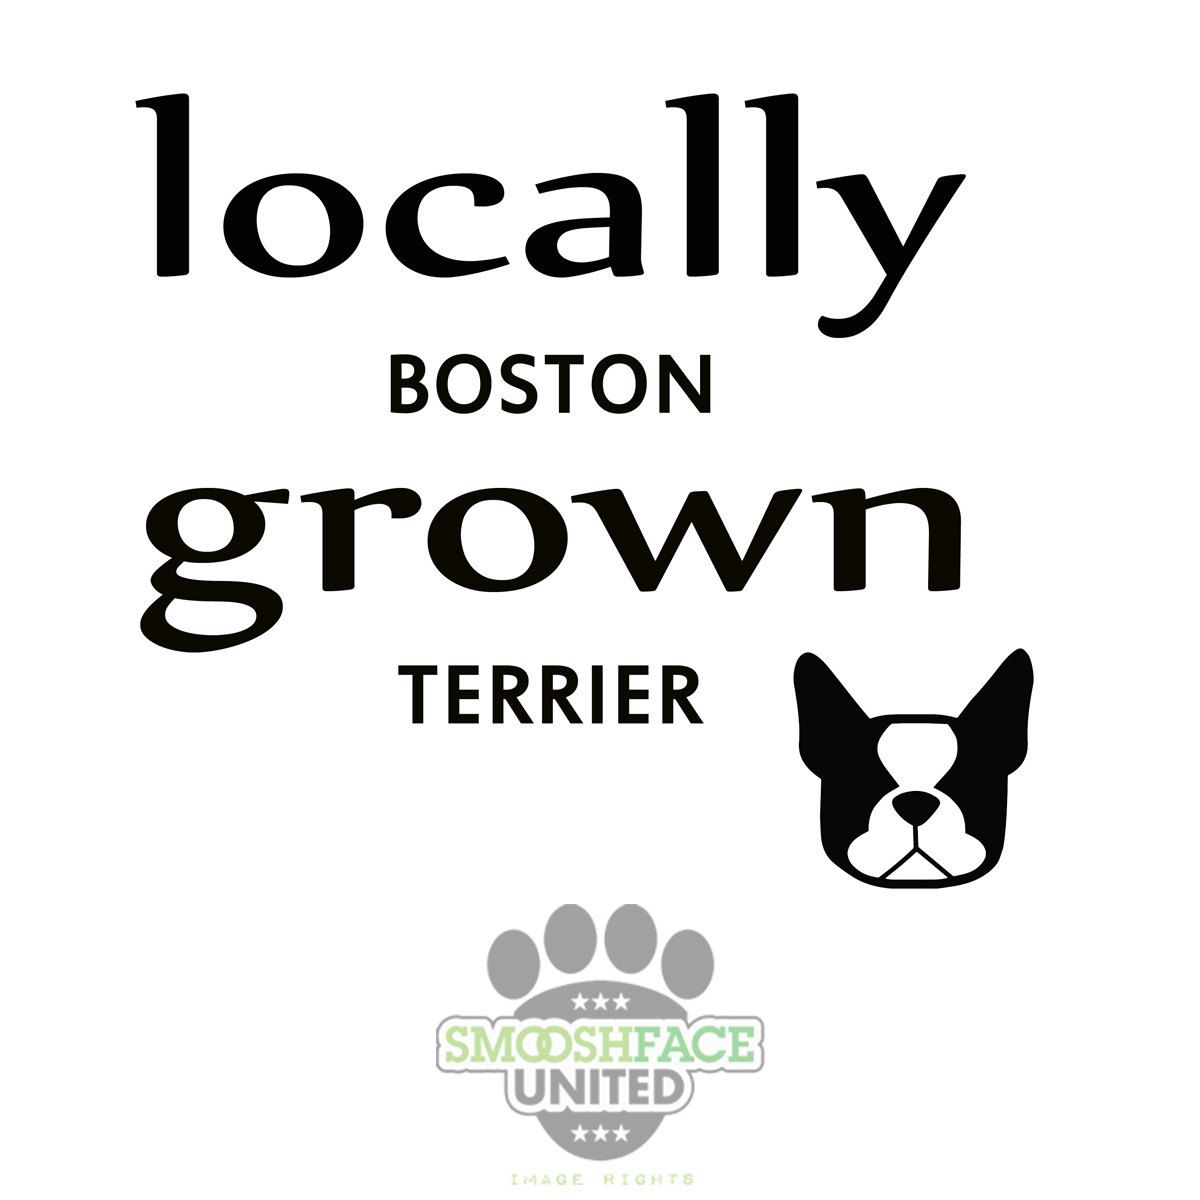 Boston Terrier Decal Cutout Vinyl Sticker Locally Grown Boston Breed Bias Bostonlove By Smooshfaceunited On Etsy Terrier Boston Terrier Vinyl Sticker